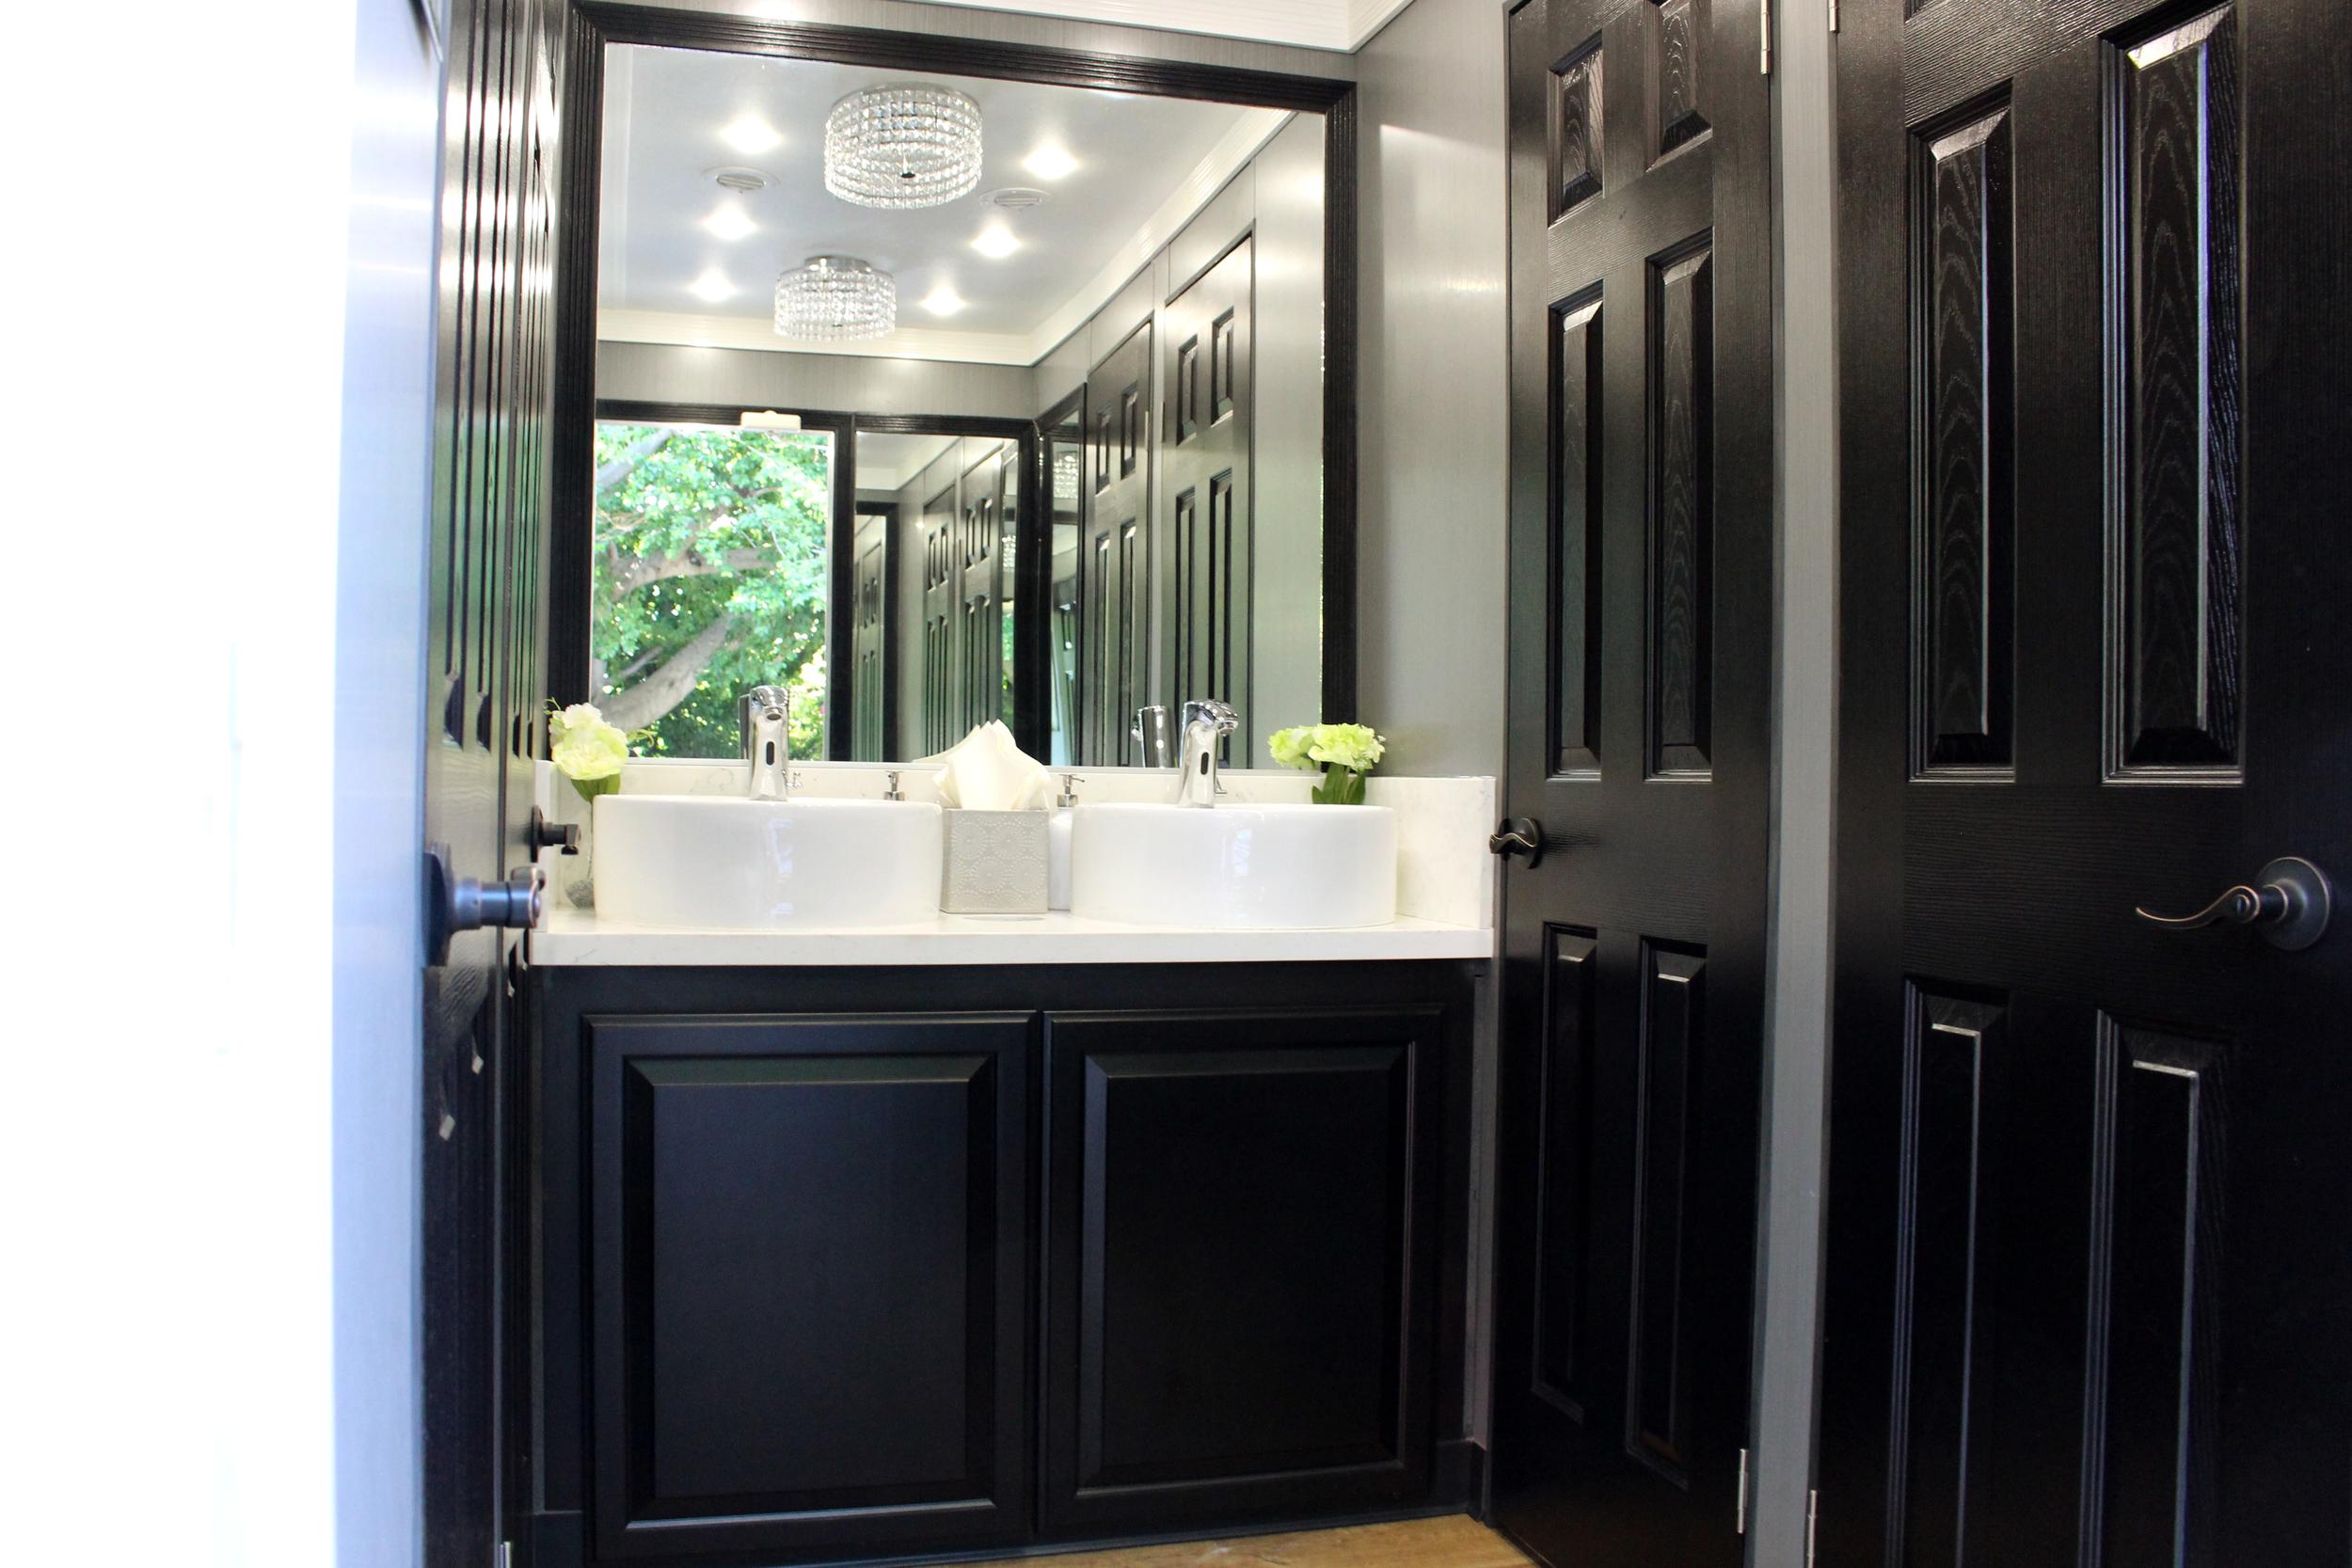 Luxury Portable Restroom Trailer Special Events, Meetings & Weddings